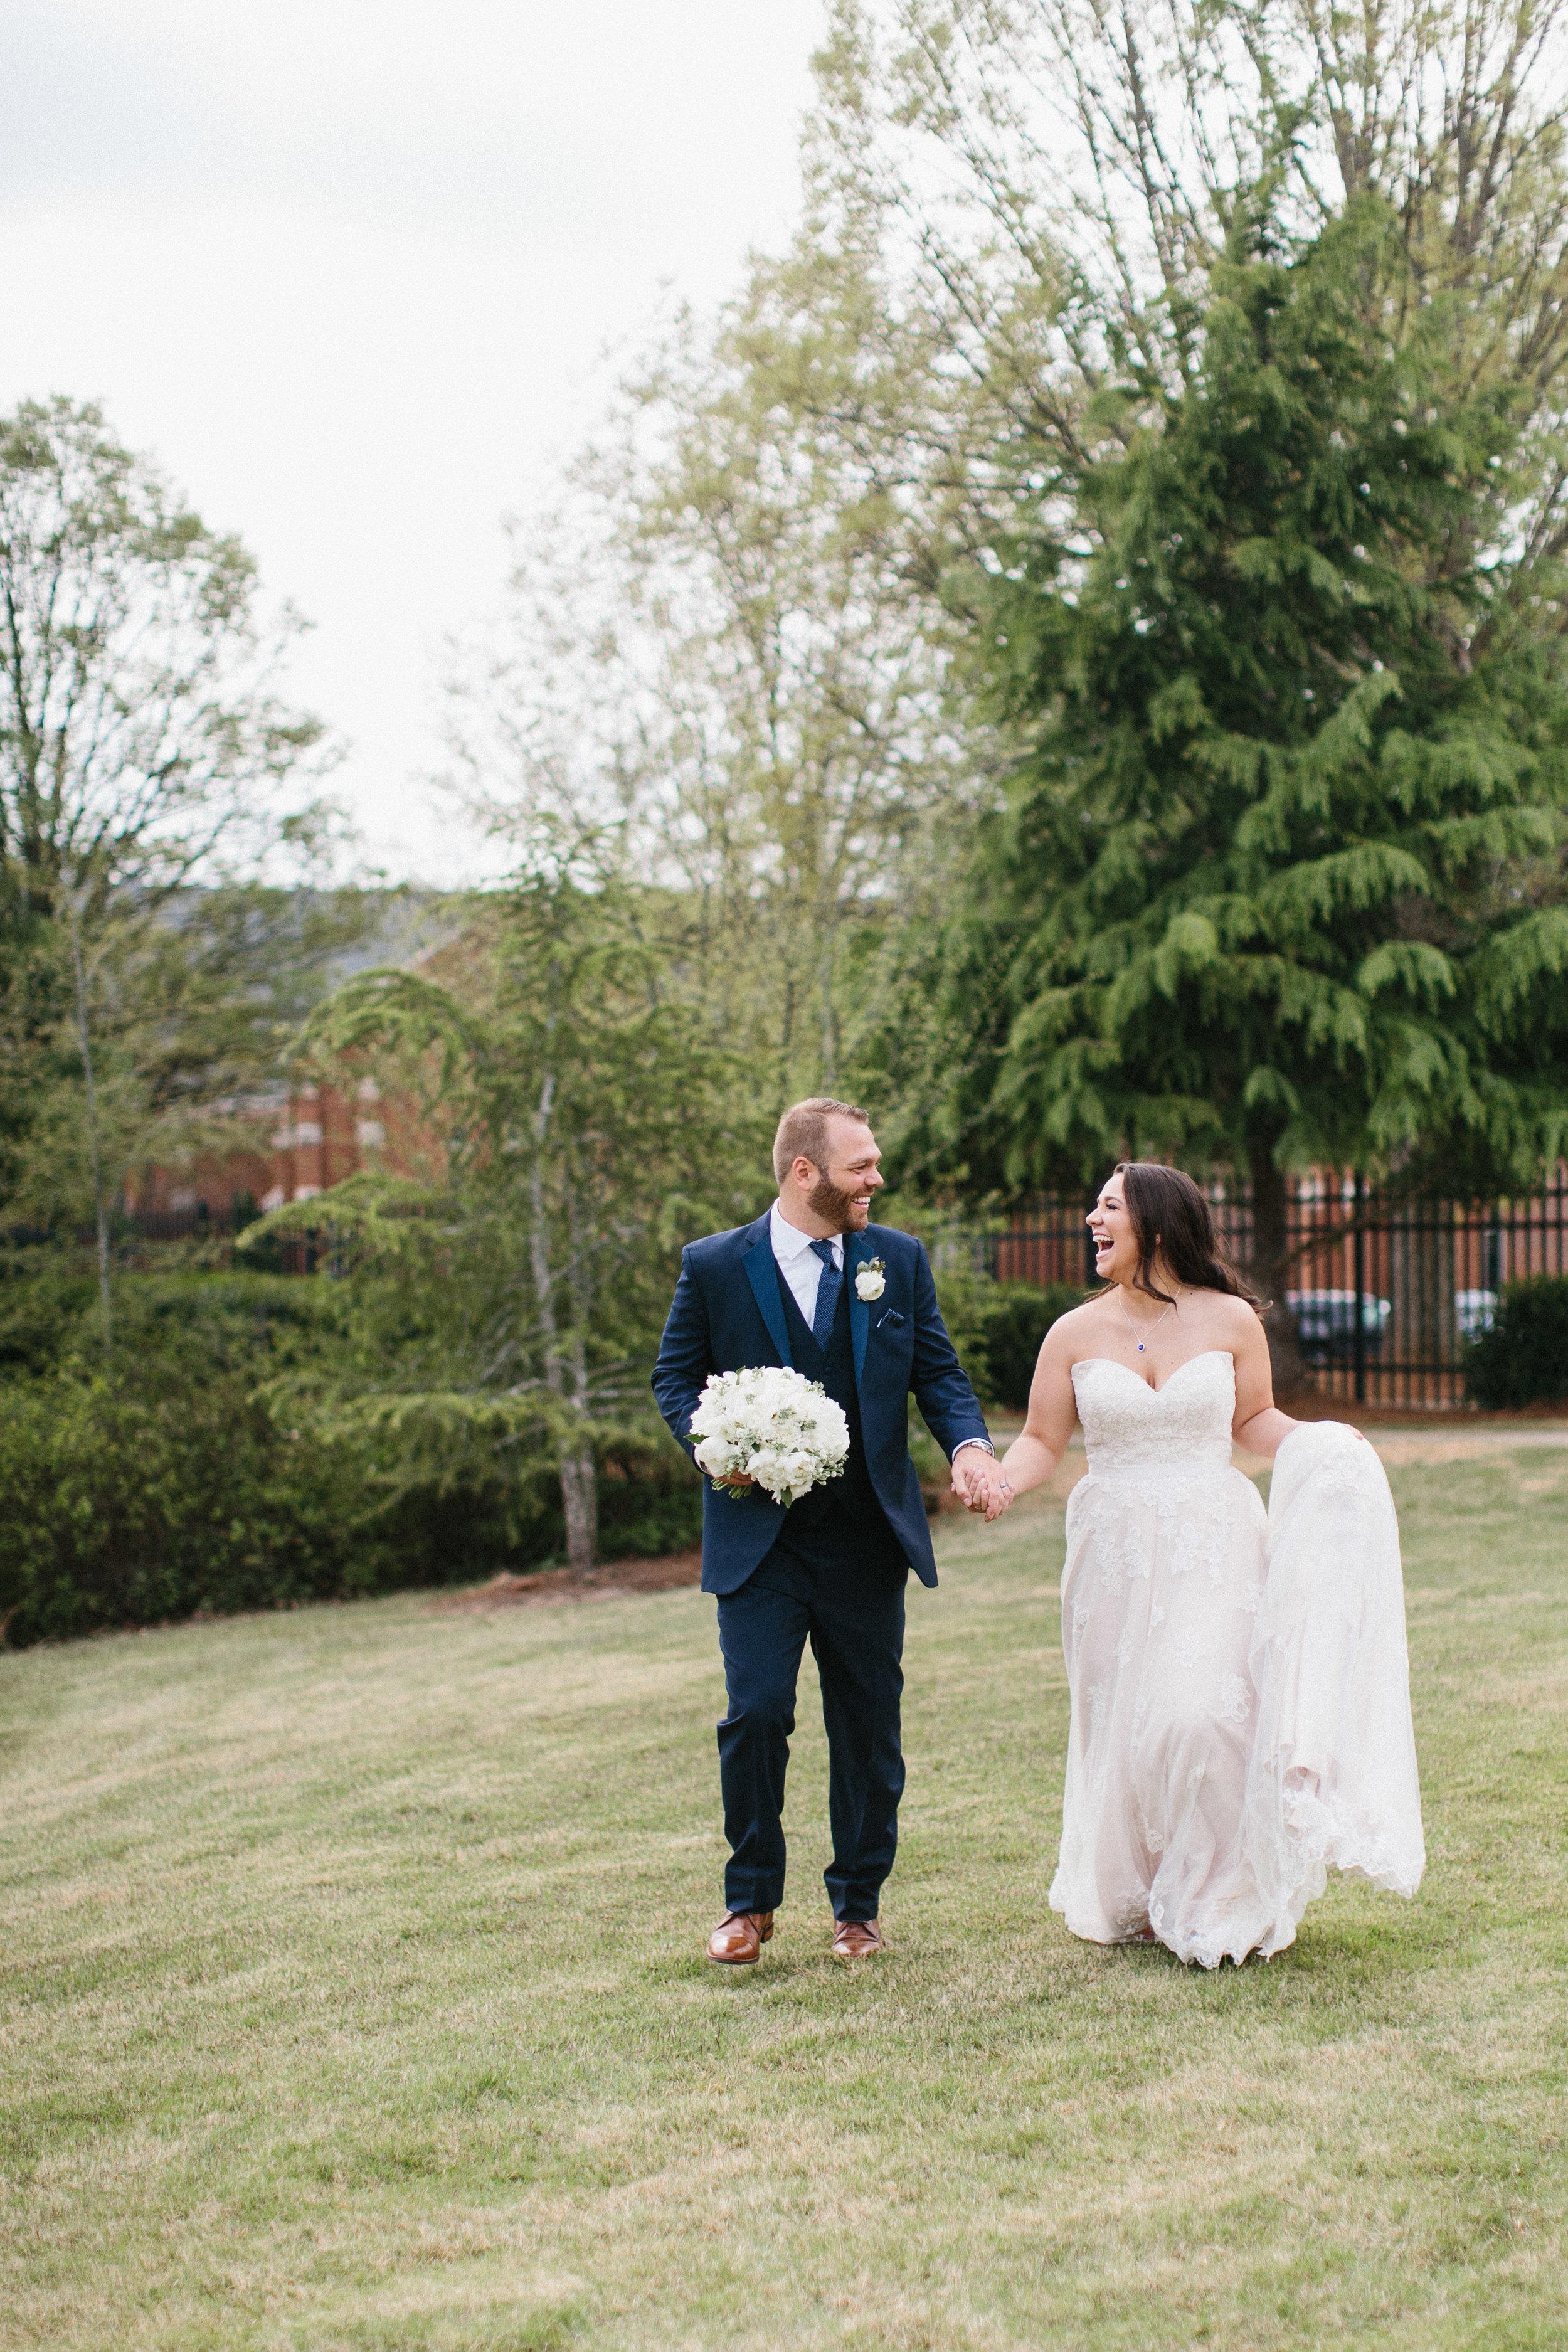 roswell_st_peter_chanel_catholic_avalon_hotel_alpharetta_wedding-1738.jpg